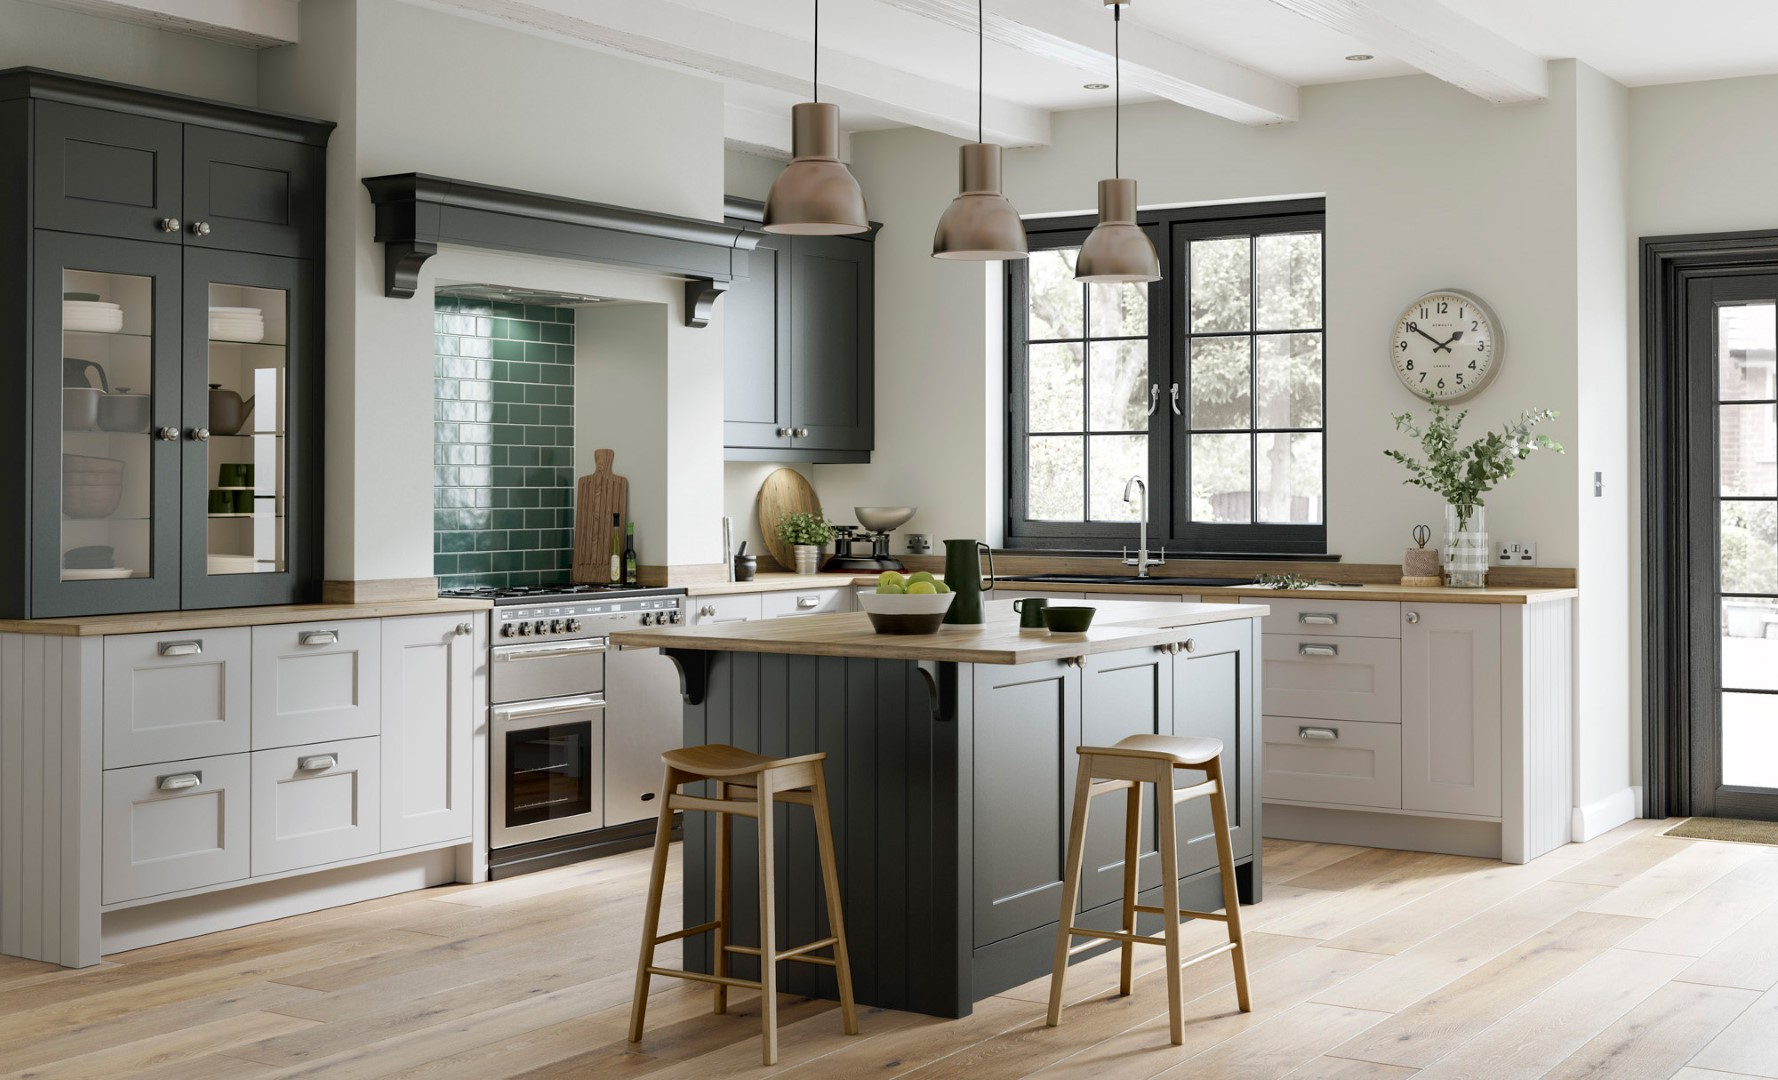 Classic Traditional Kitchen - Florence Graphite, Light Grey Kitchen - Kitchen Design - Alan Kelly Kitchens - Waterford